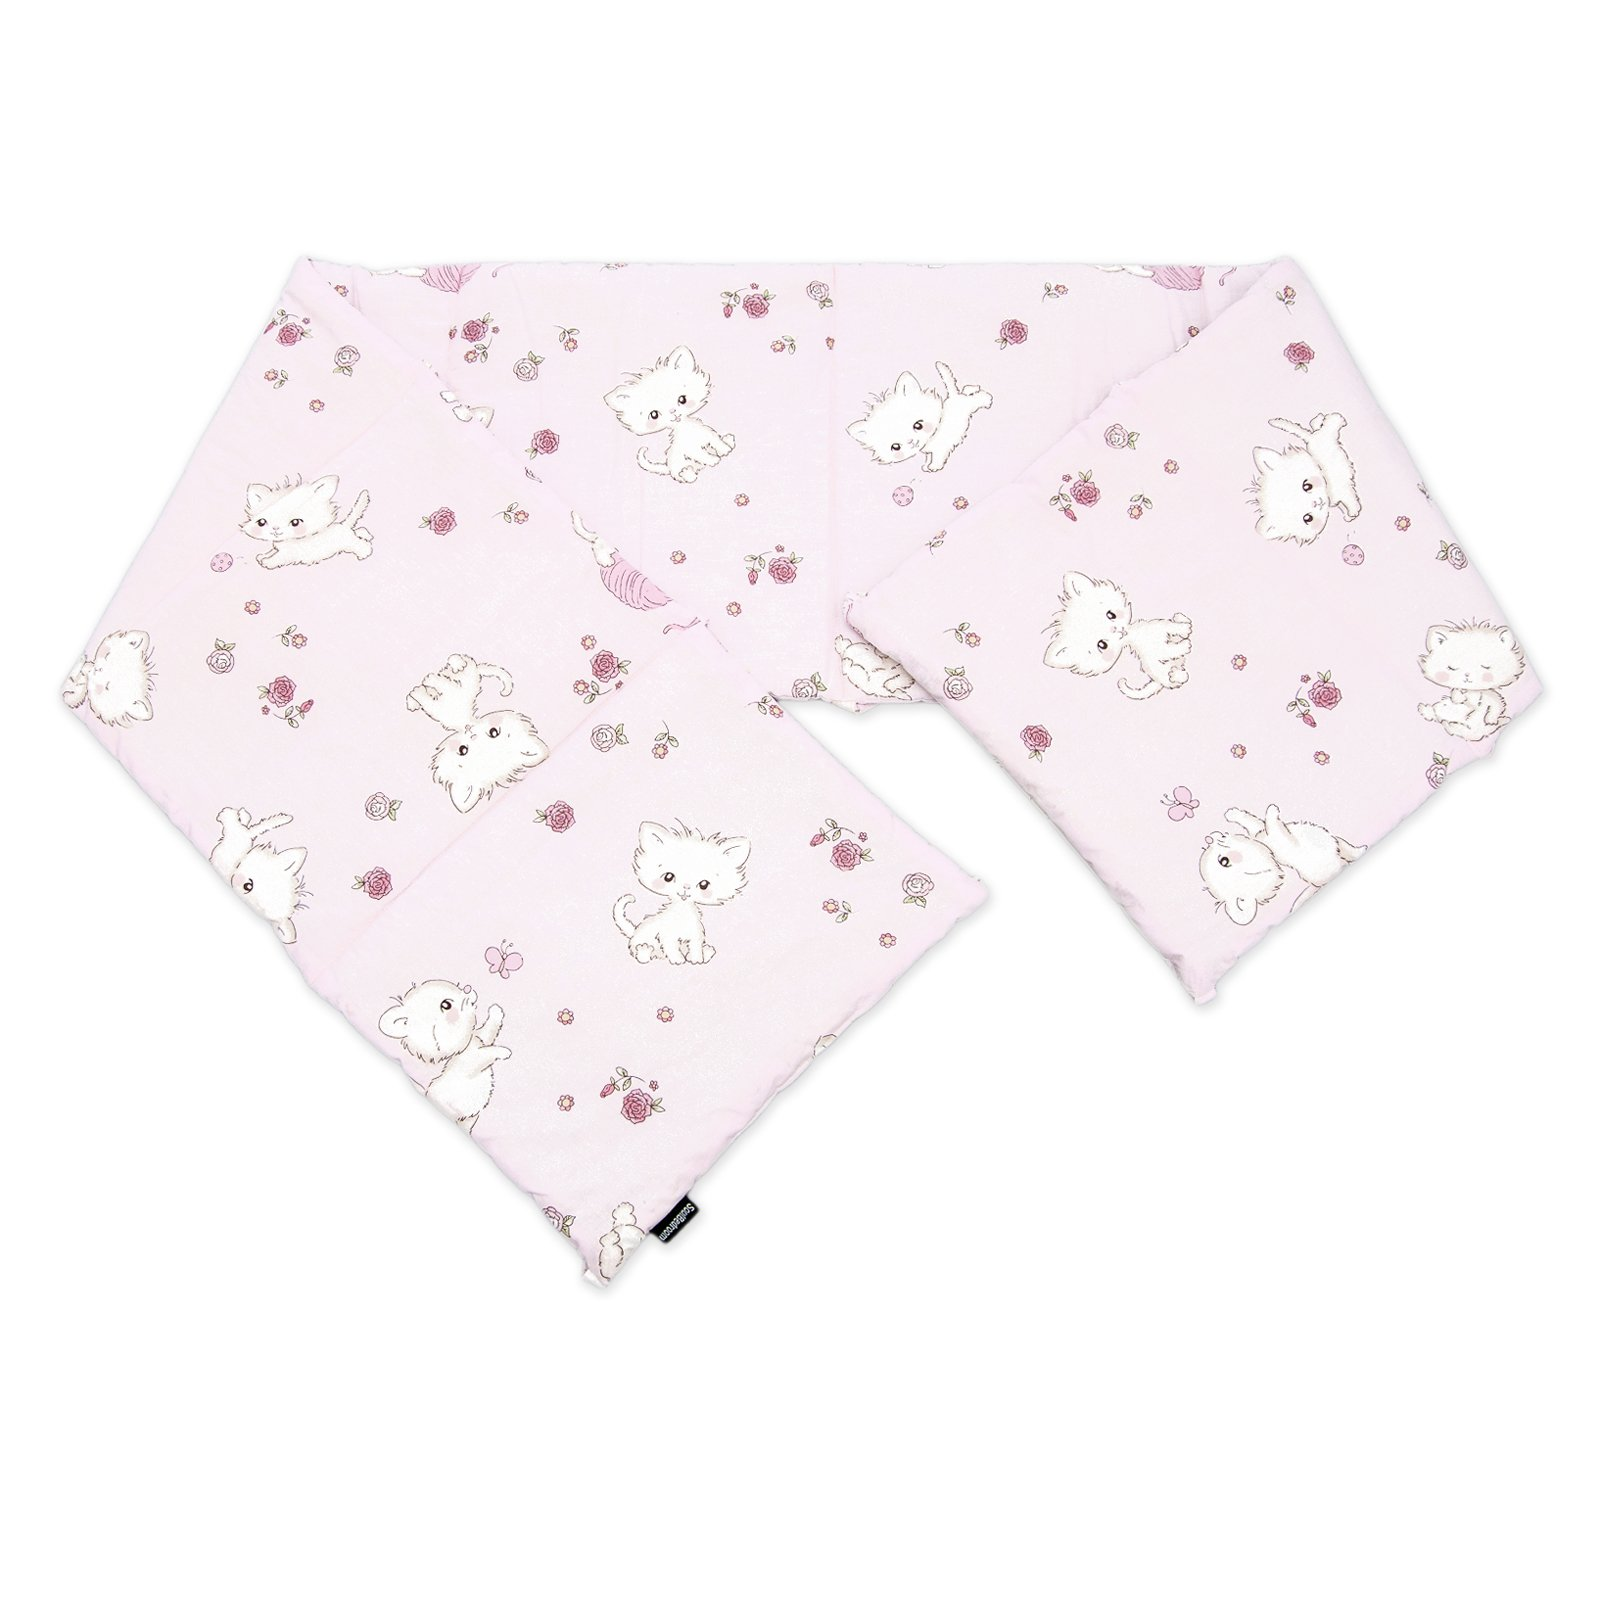 Baby Pink Kittens / SoulBedroom Cotton Cot Bumper Pad Half (210x40 cm)